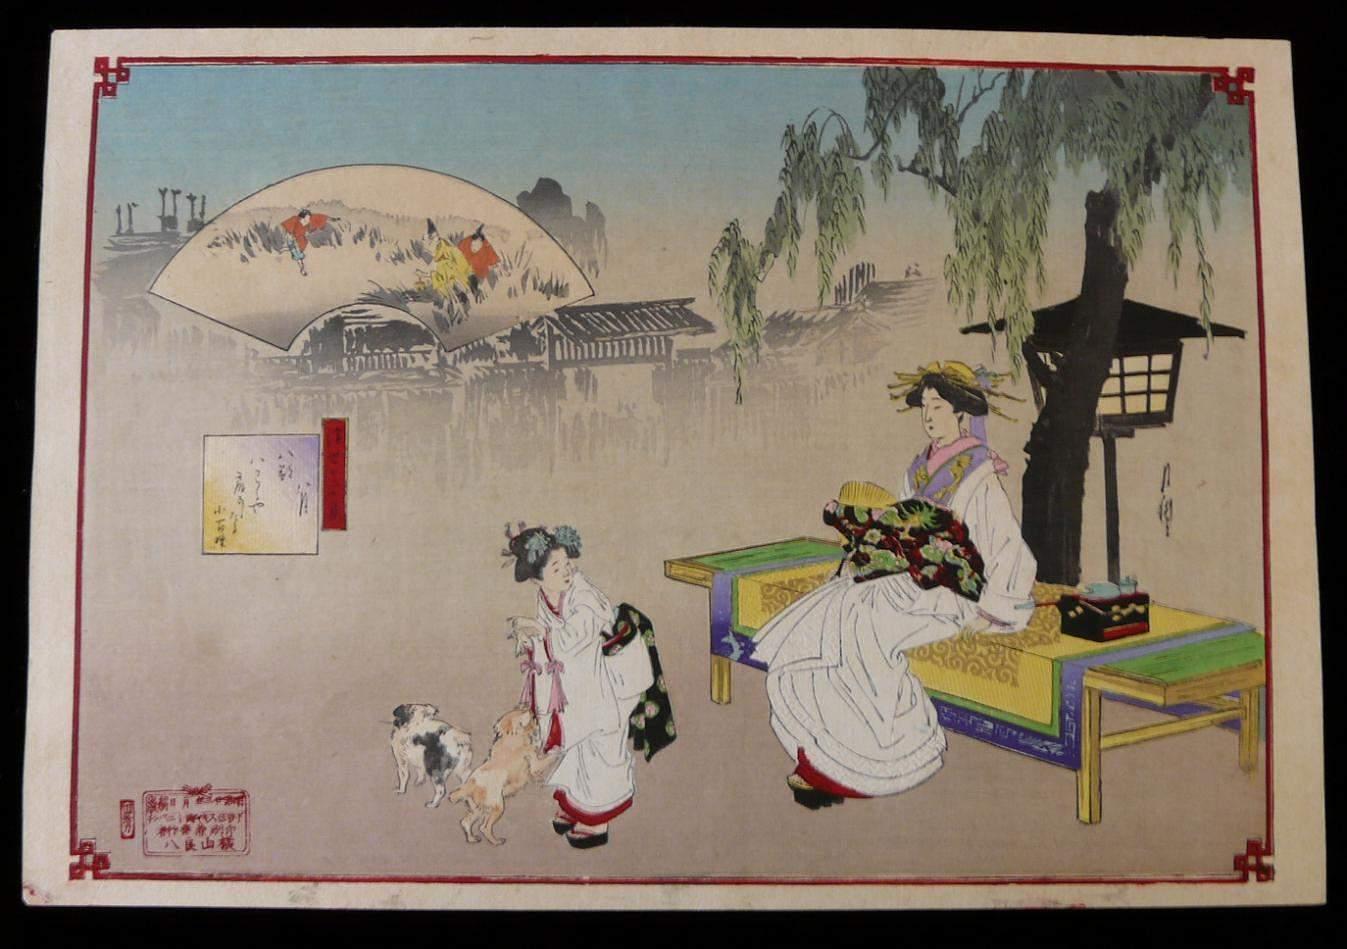 GEKKO OGATA: #P2268 FROM THE SERIES JUNIKAGETSU - TWELVE MONTHS OF UKIYO (1890)